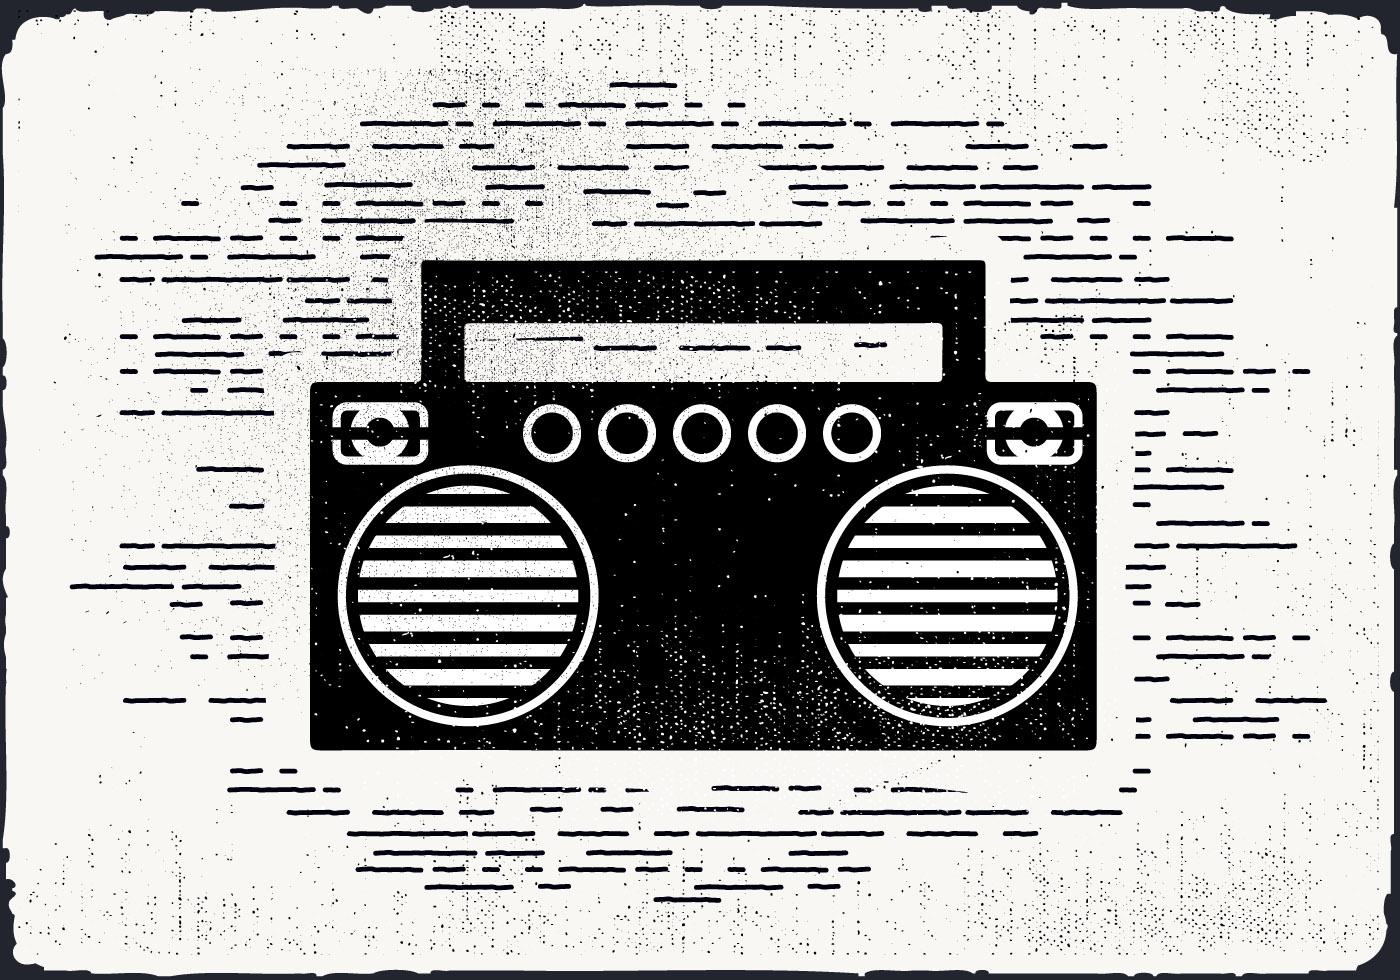 Free Vintage Music Player Vector Illustration